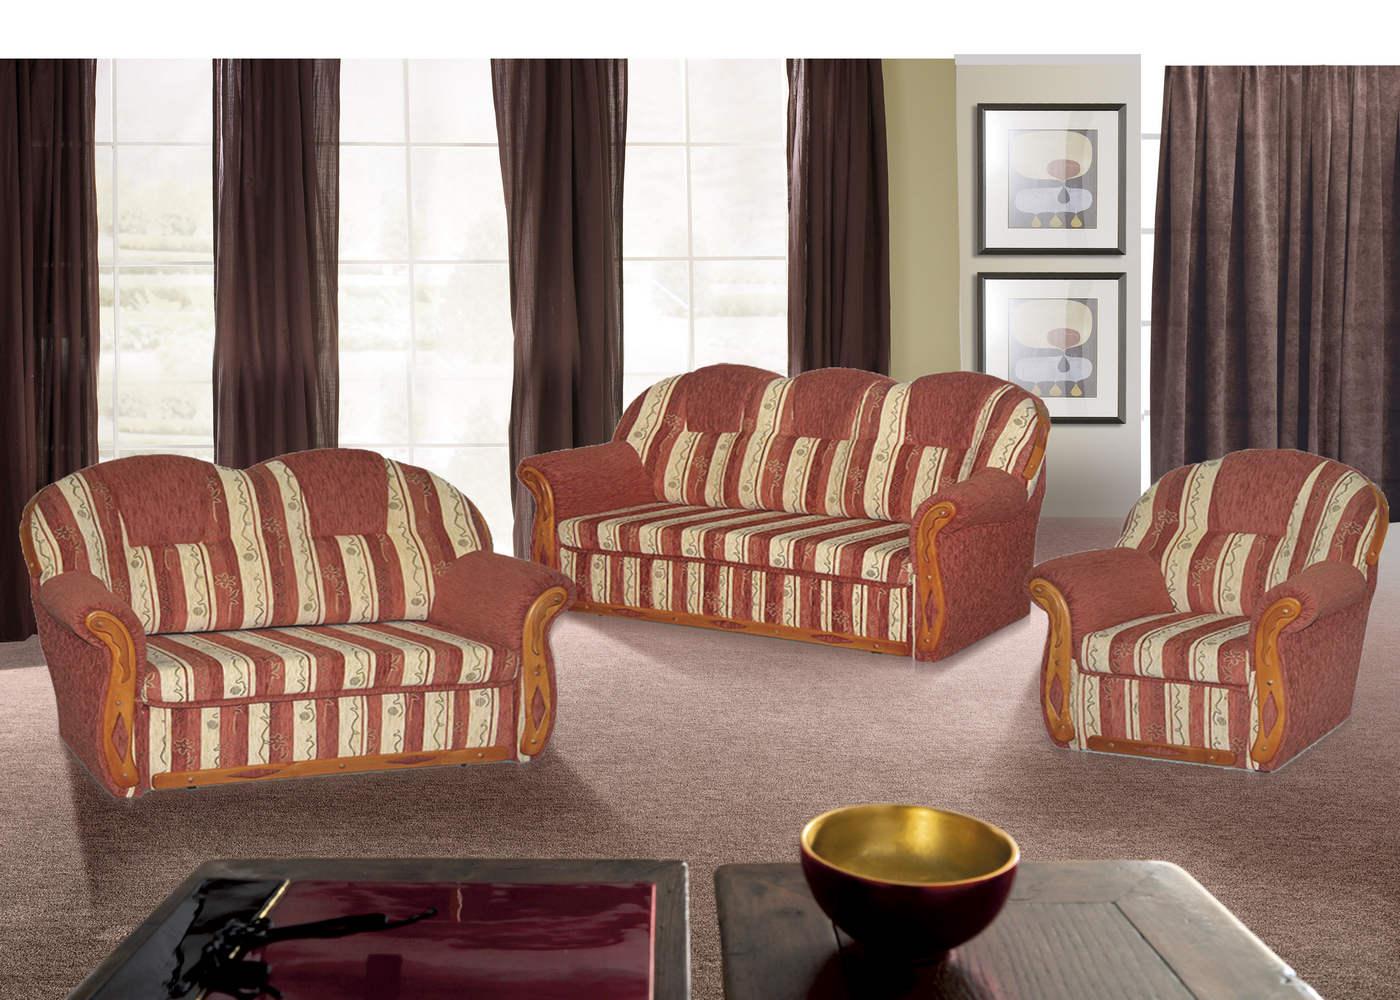 ADAM 3-2-1 Ágyazható Ülőgarnitúra-Bútor, Robi Bútor Nagykereskedés ...